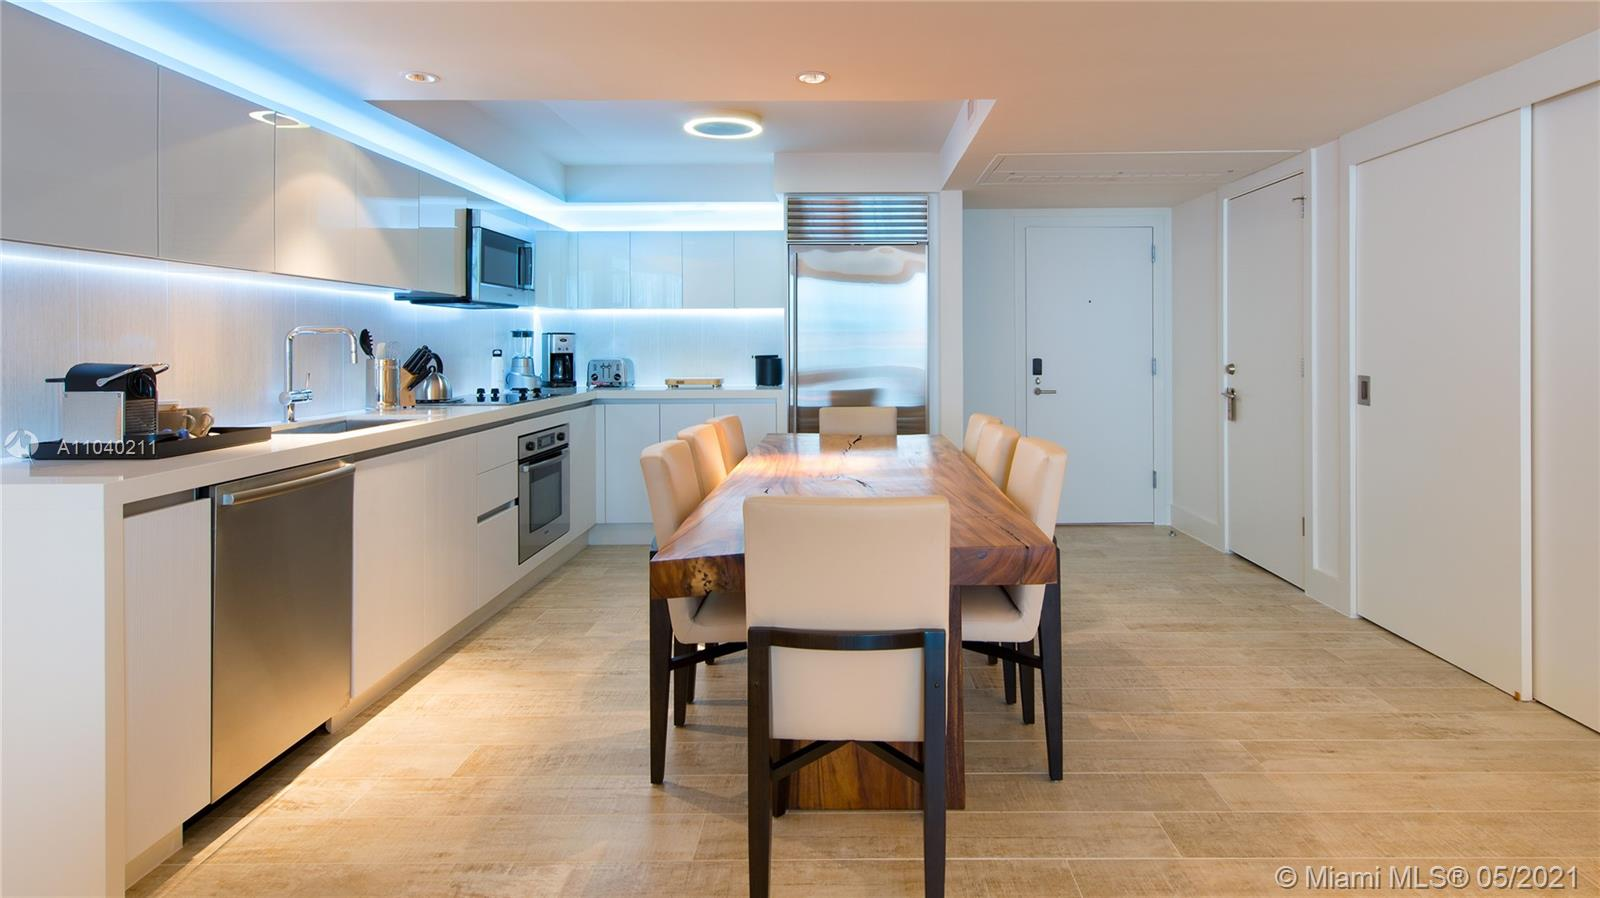 1 Hotel & Homes #1540 - 102 24th St #1540, Miami Beach, FL 33139